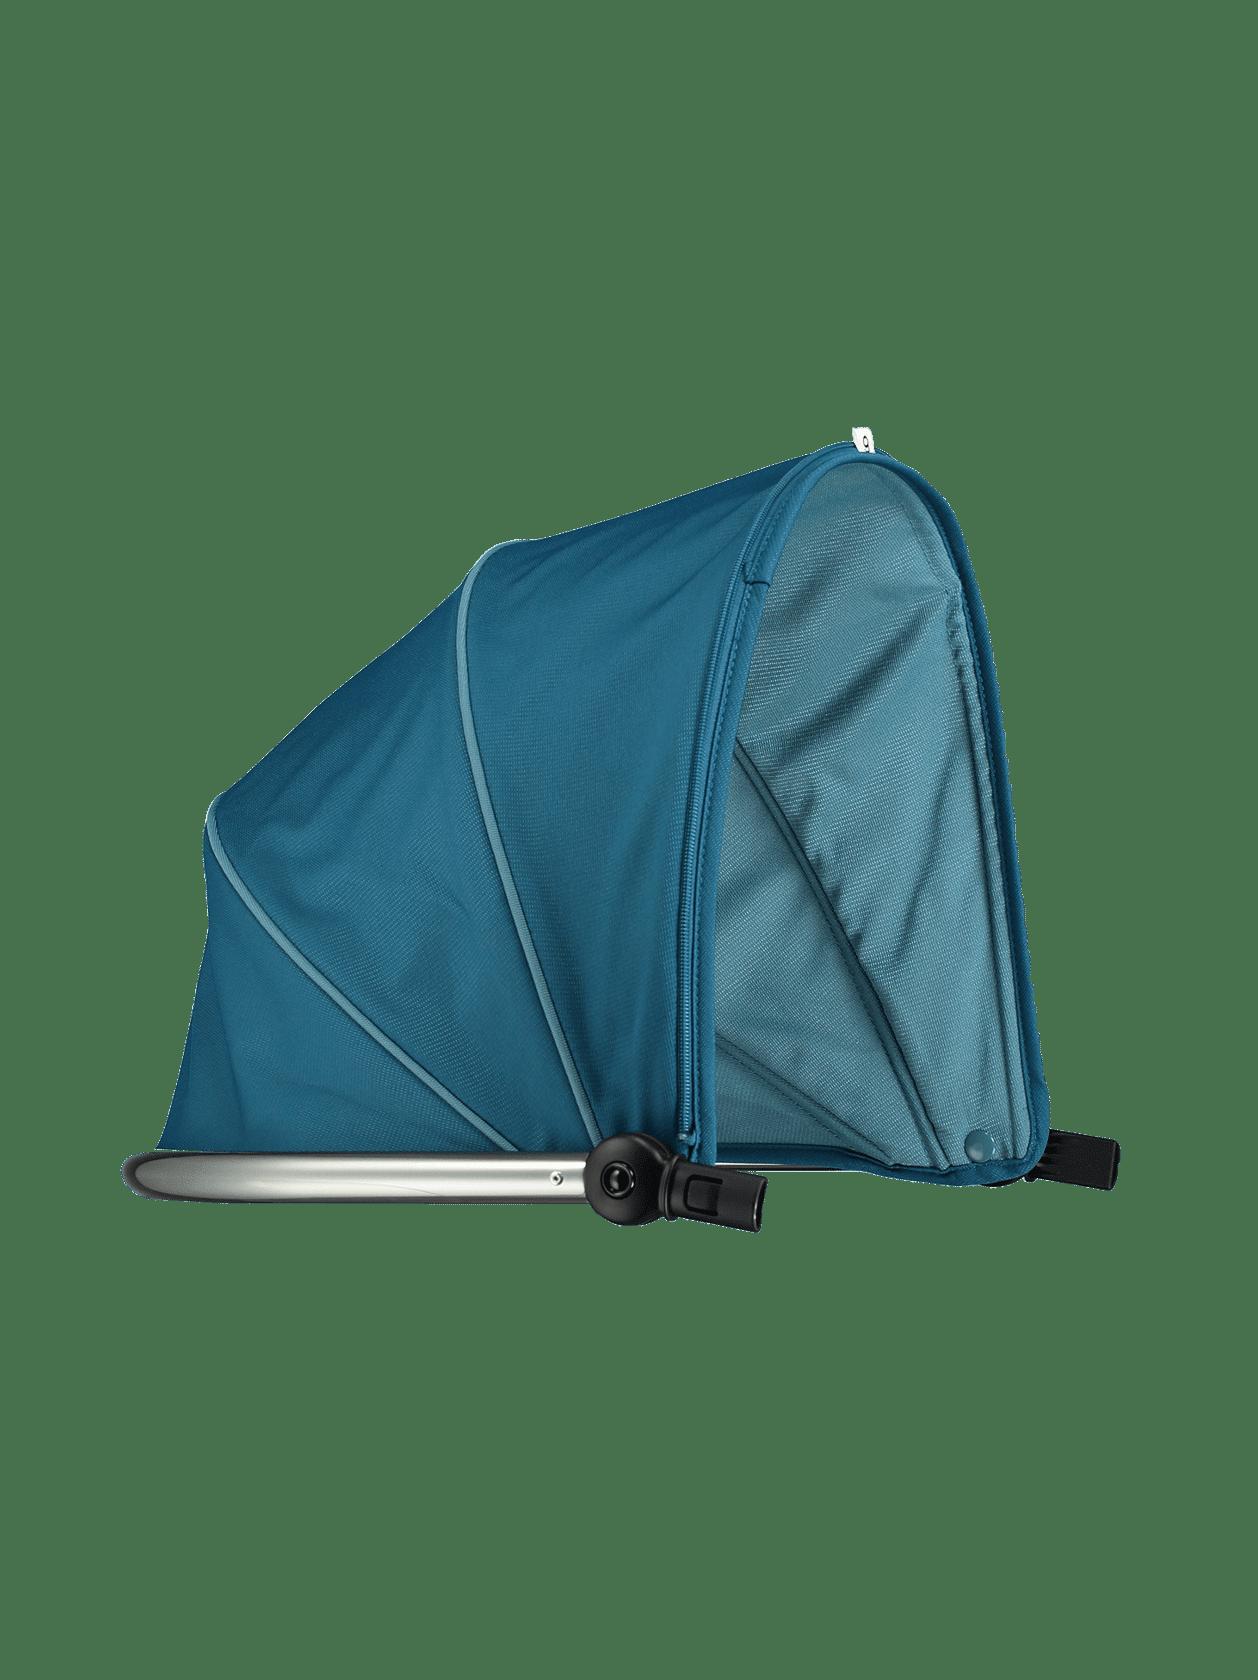 Peach Lower Seat Hood - Peacock